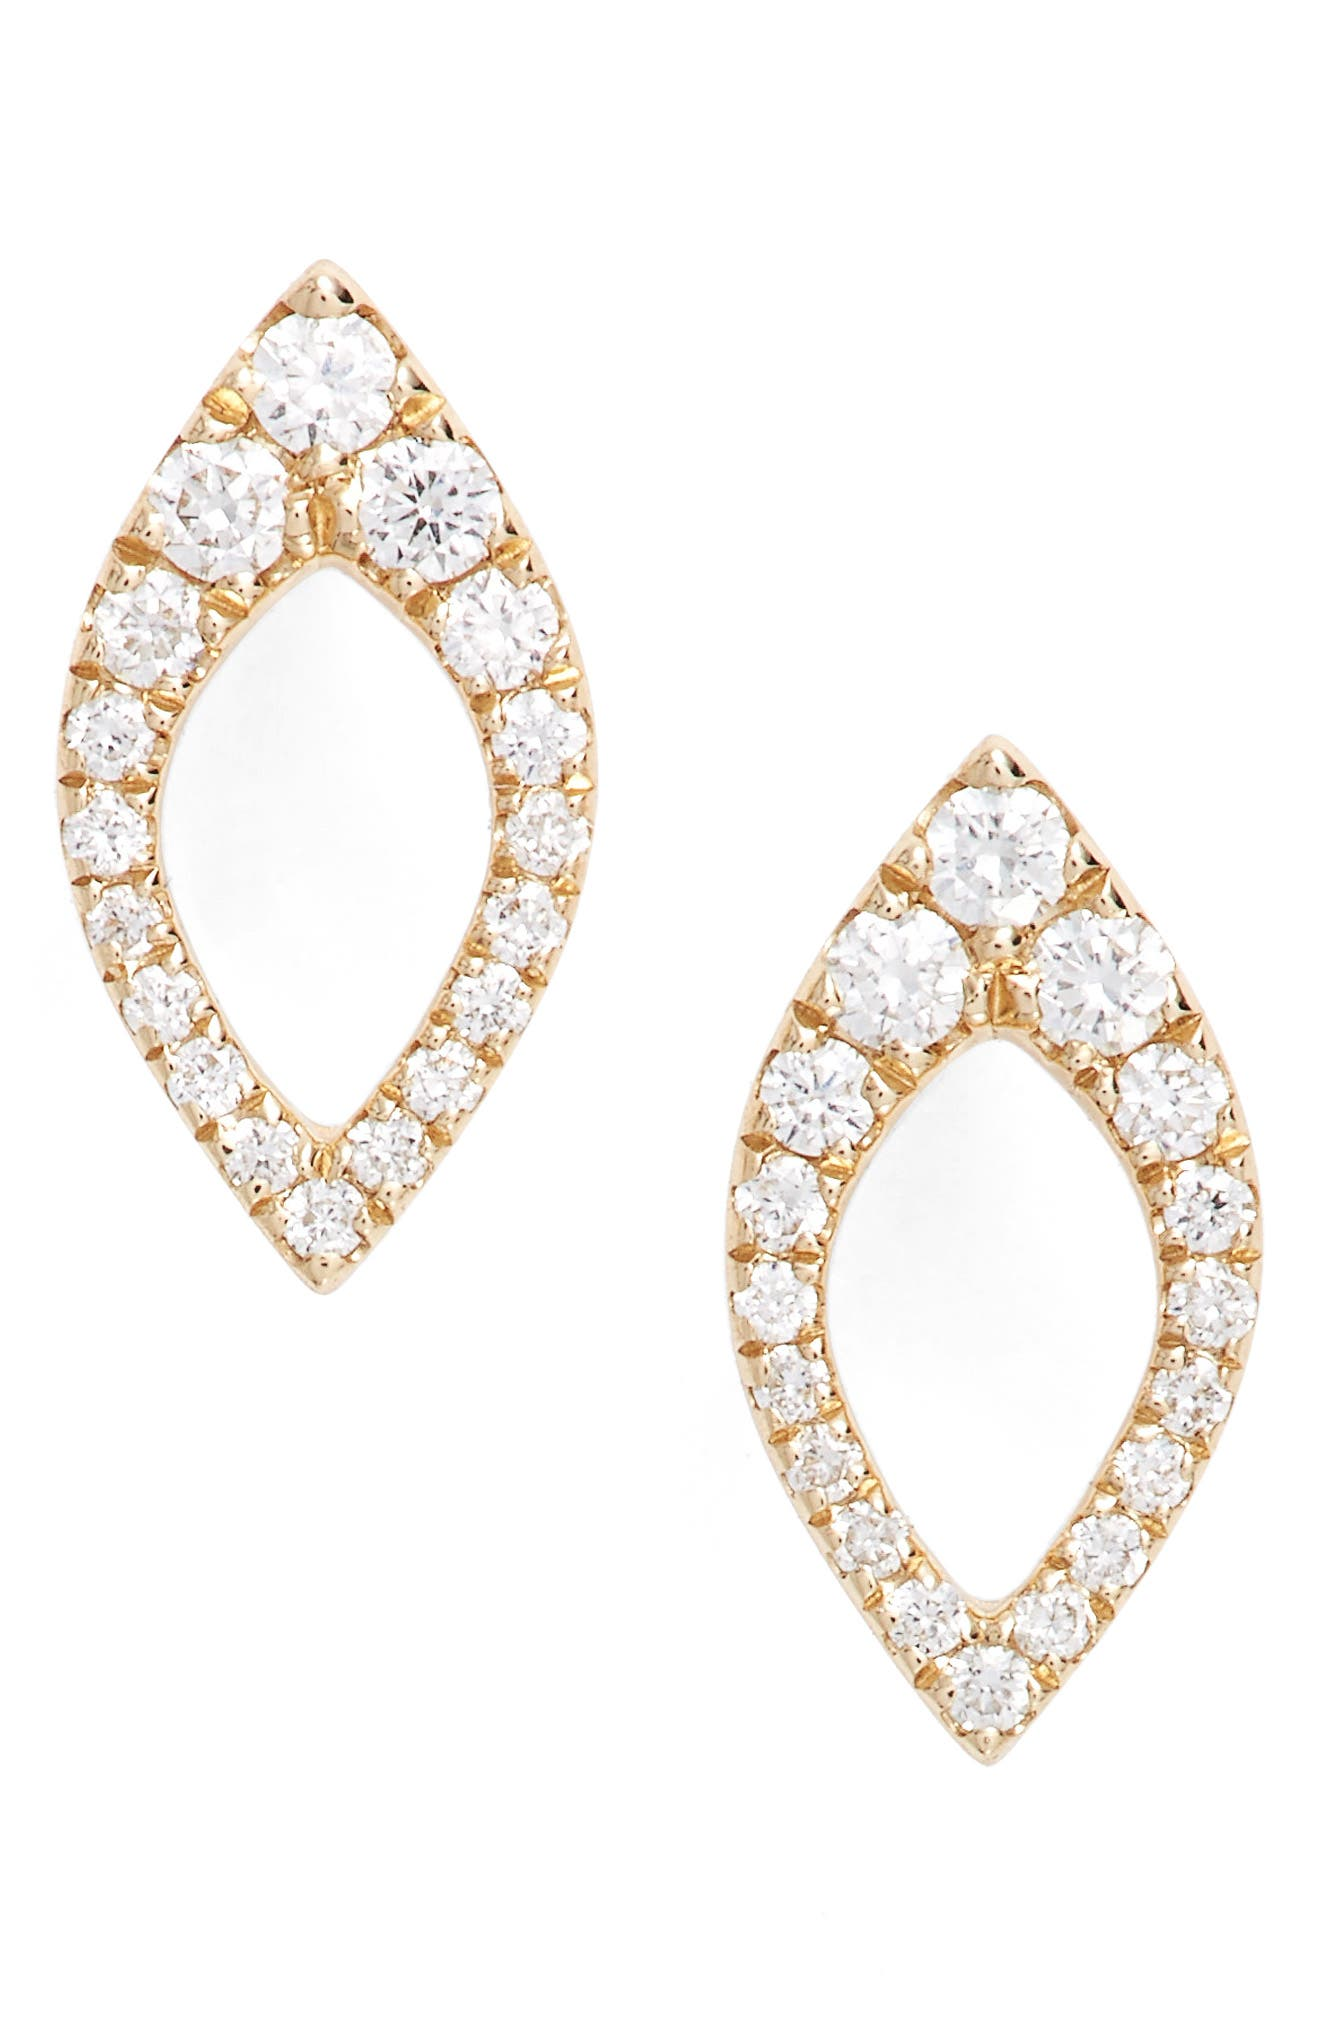 DANA REBECCA DESIGNS Marquise Diamond Studs